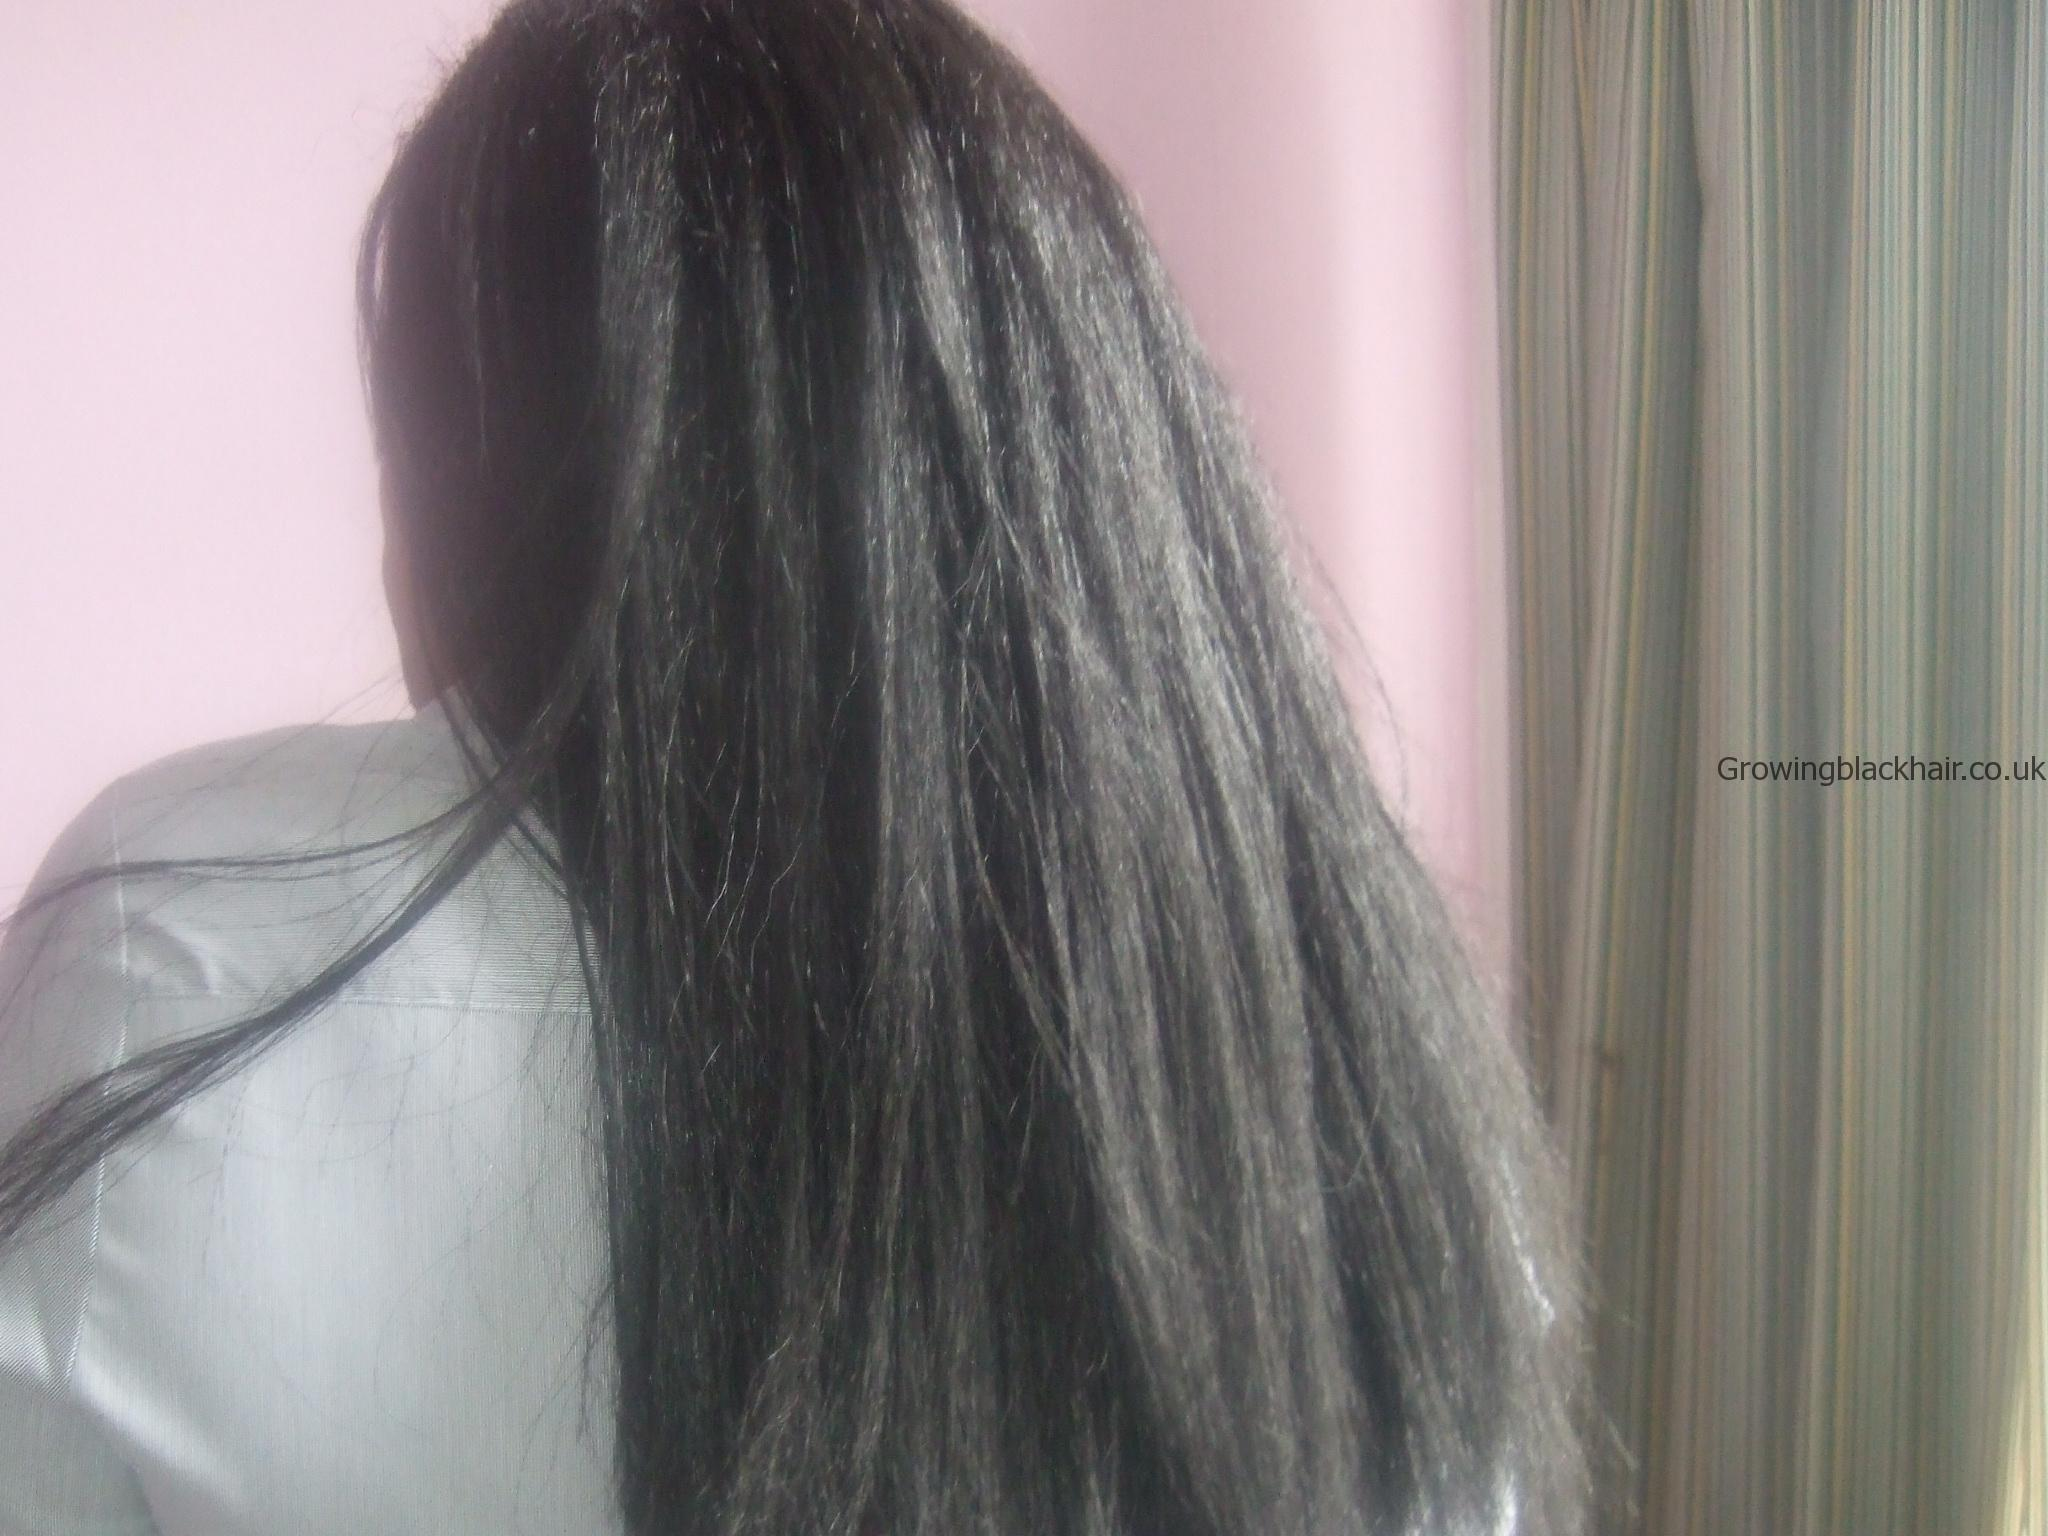 Black natural hair care - Crochet braids Growing black hair